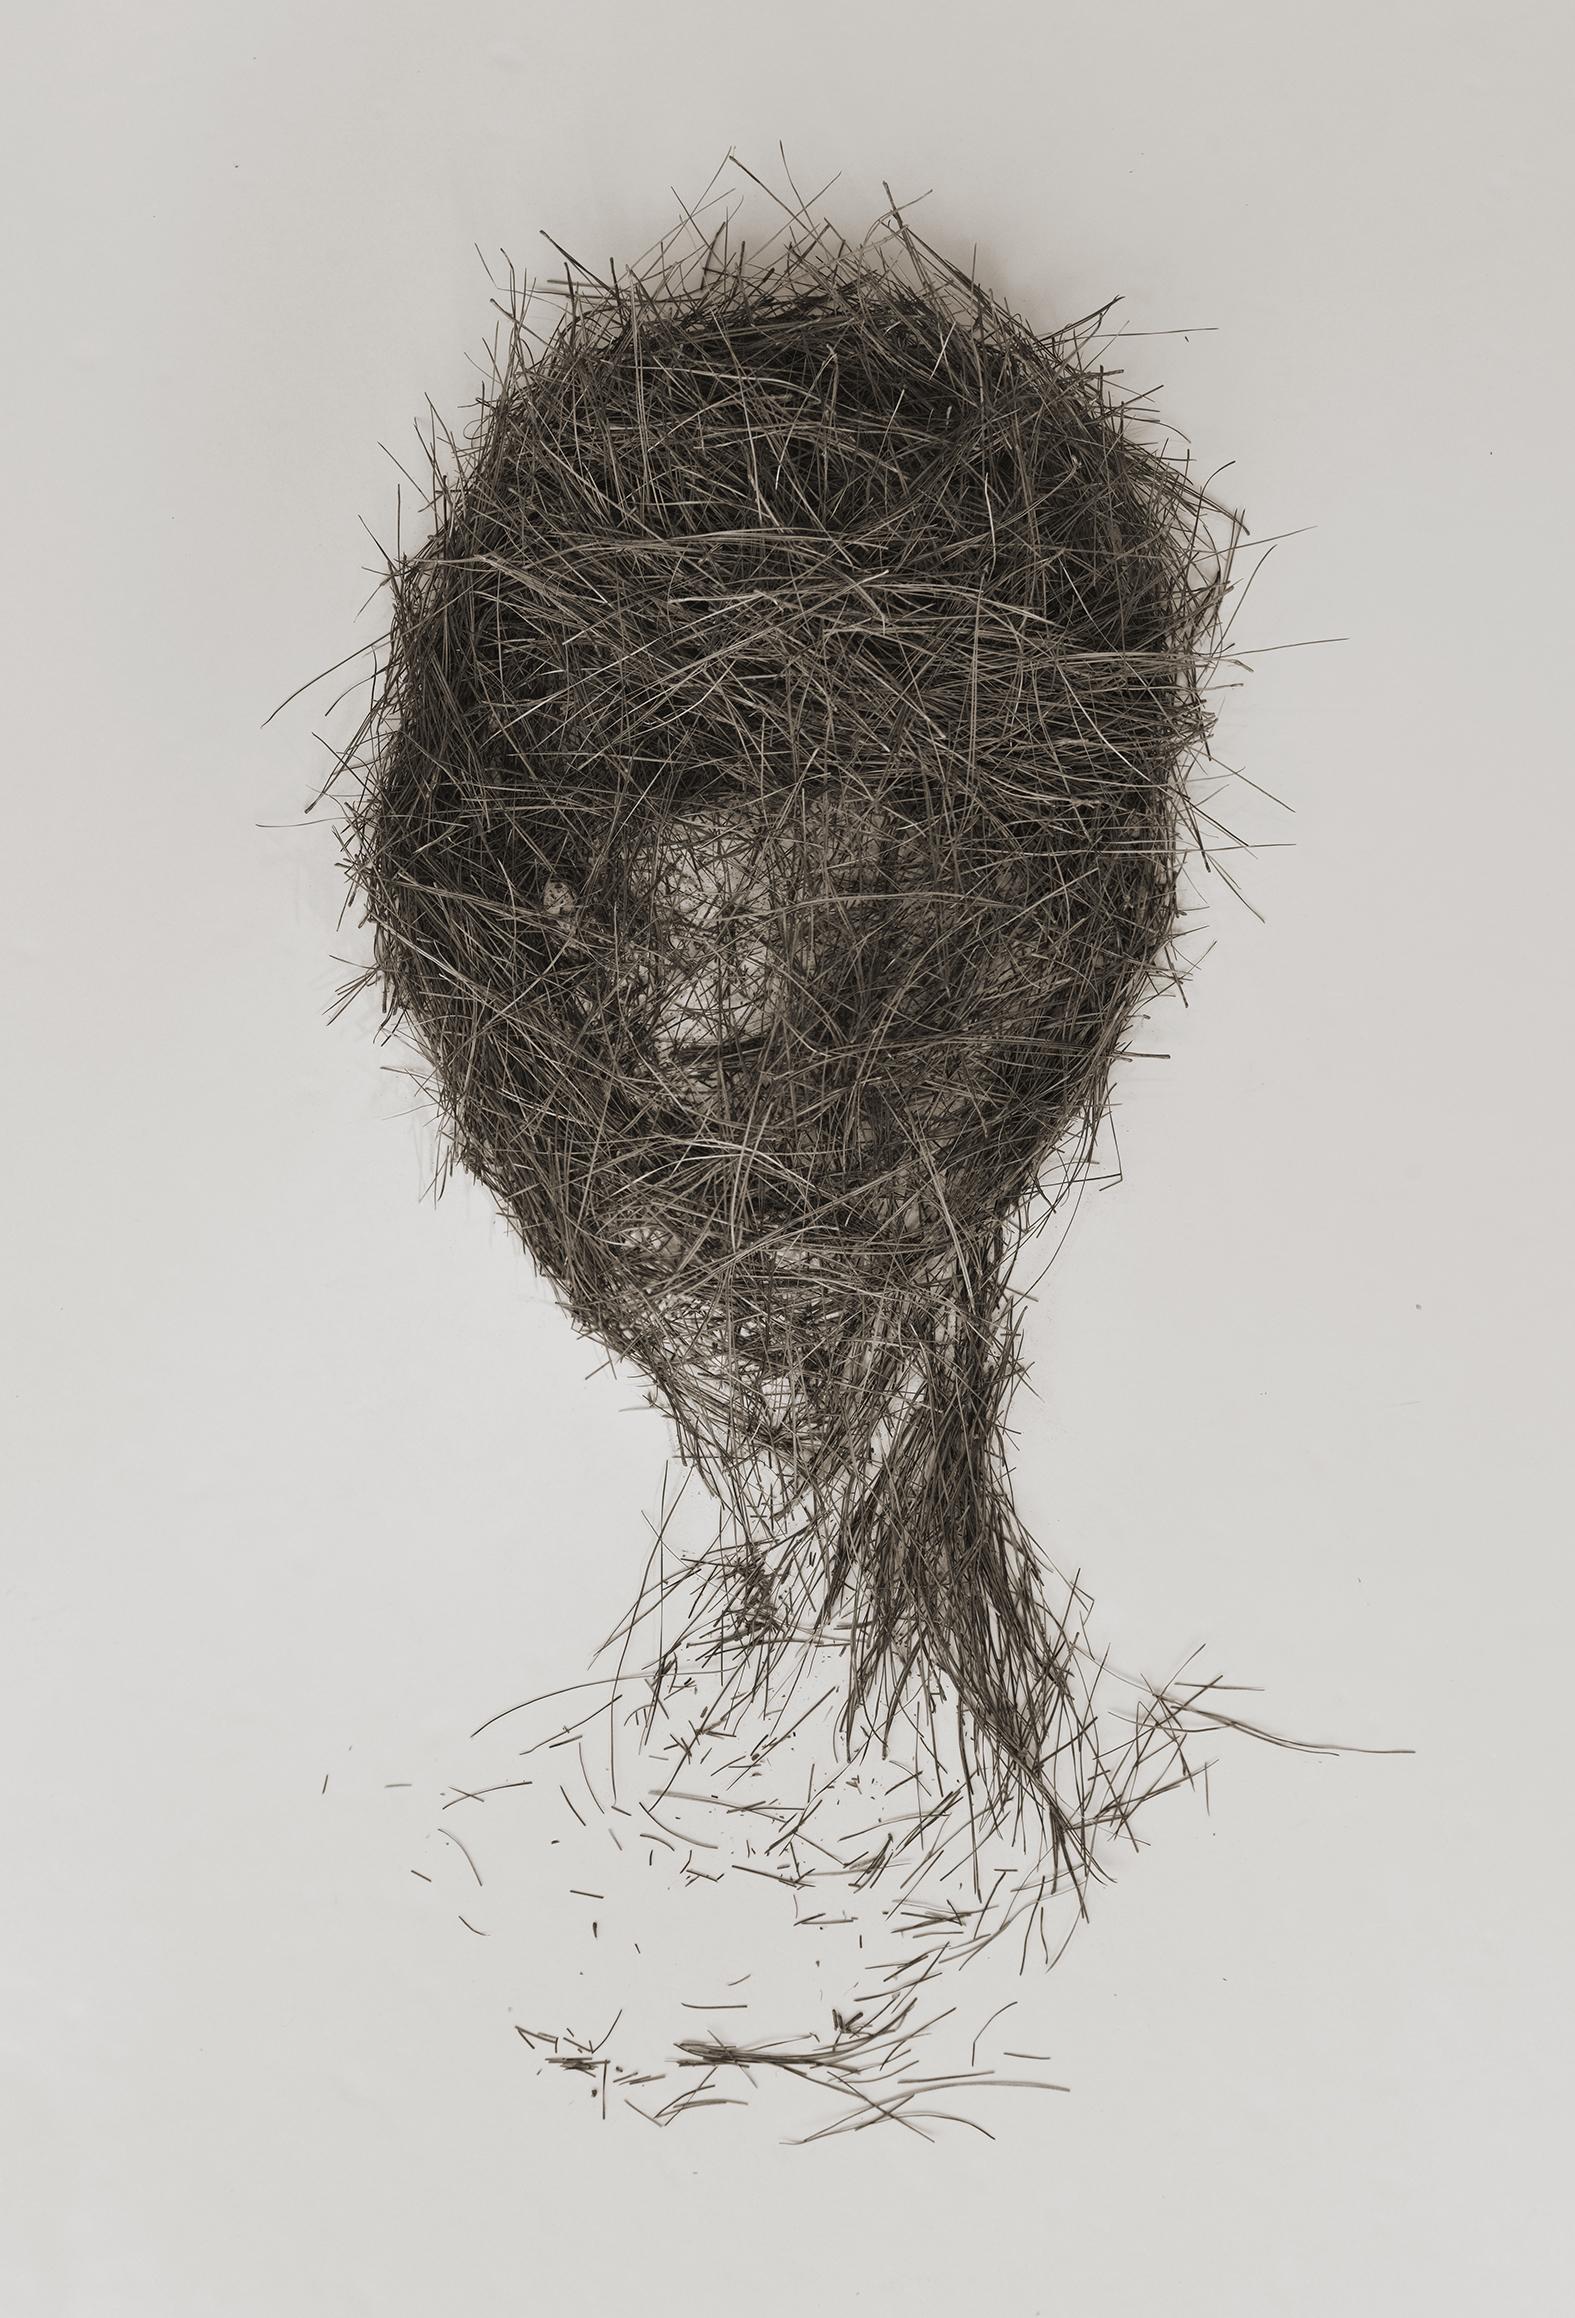 Head of Edith, pine needle drawing. Digital print, 2016.